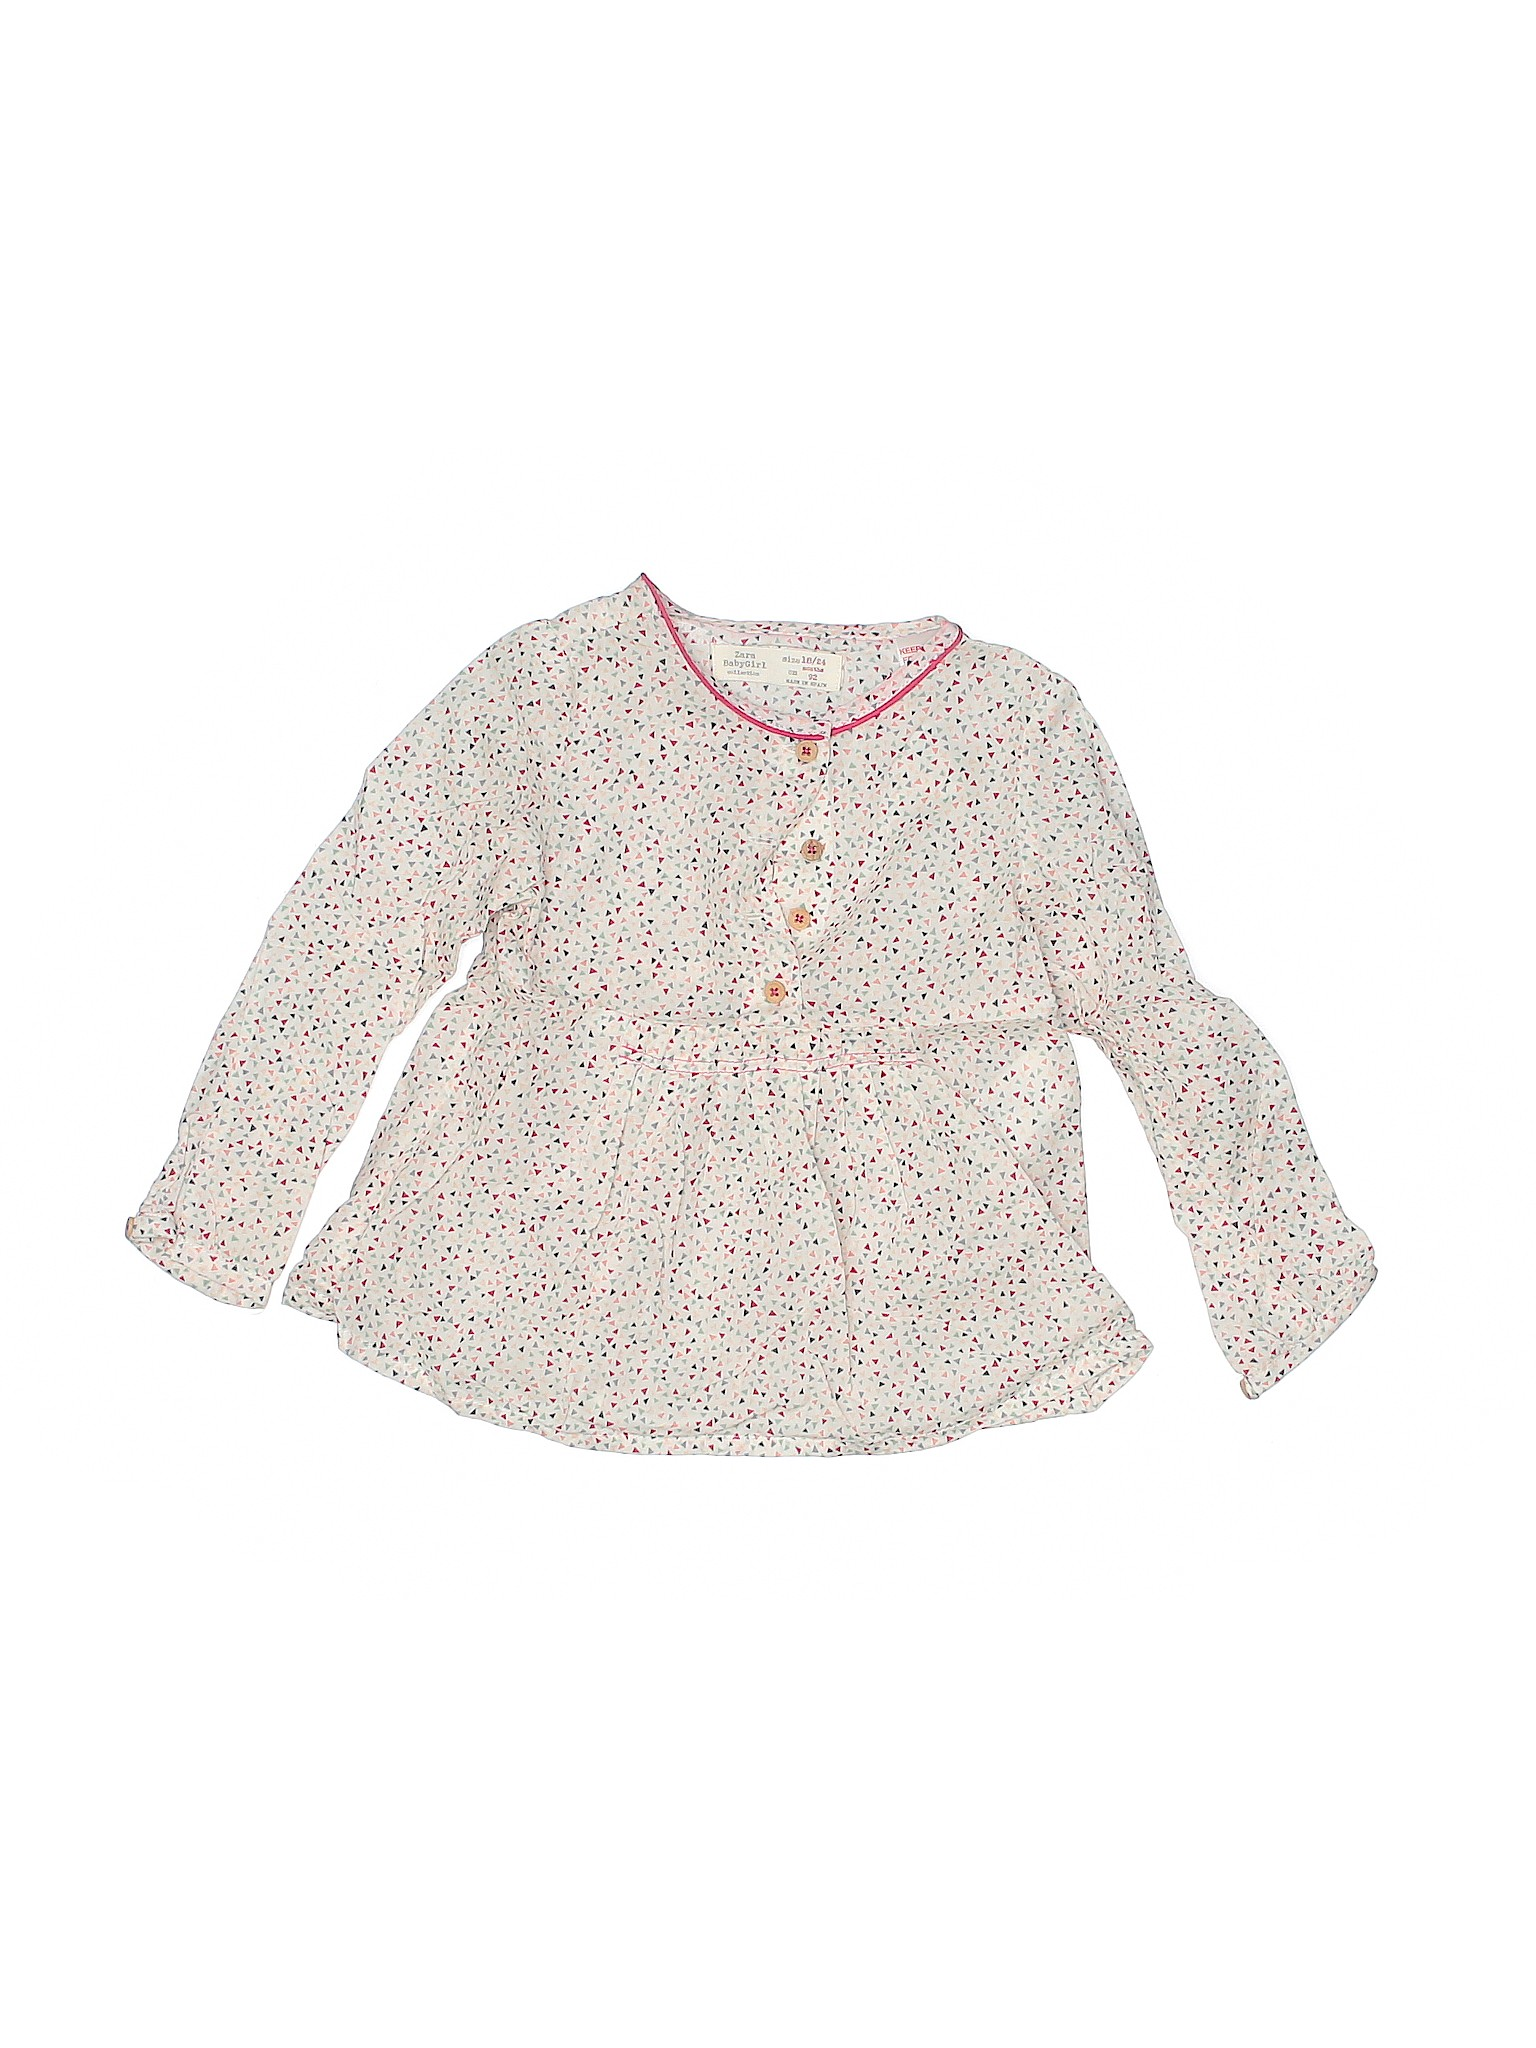 Zara Baby - Pre-Owned Zara Baby Girl's Size 18-24 Mo Dress ...